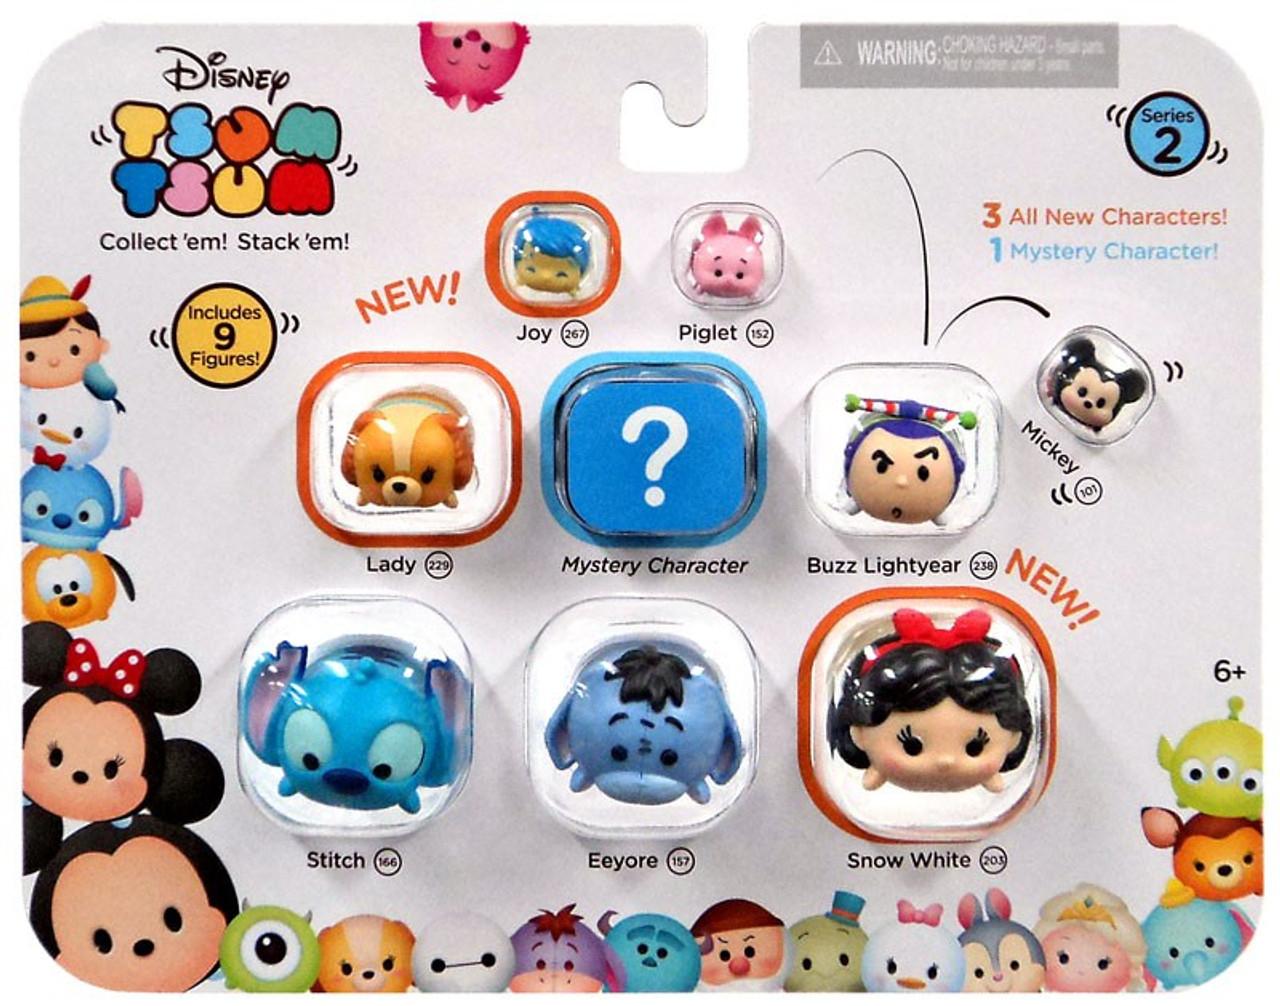 Disney Tsum Tsum Para Colorear Buzz Lightyear: Disney Tsum Tsum Series 2 Joy, Piglet, Mickey, Lady, Buzz